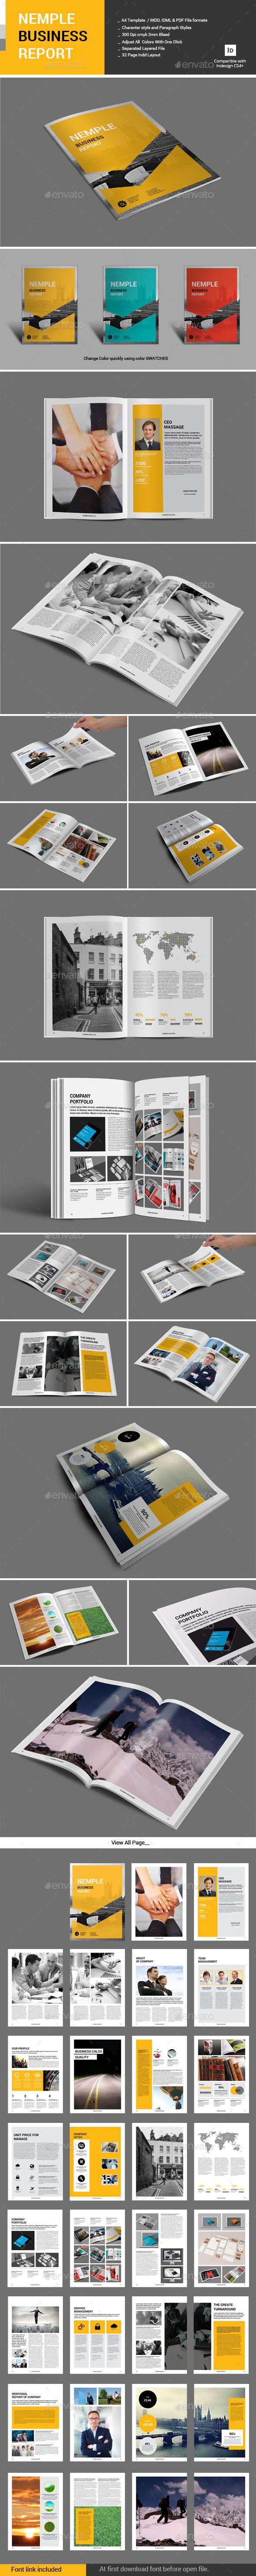 GraphicRiver Nemple Business Report 10929668